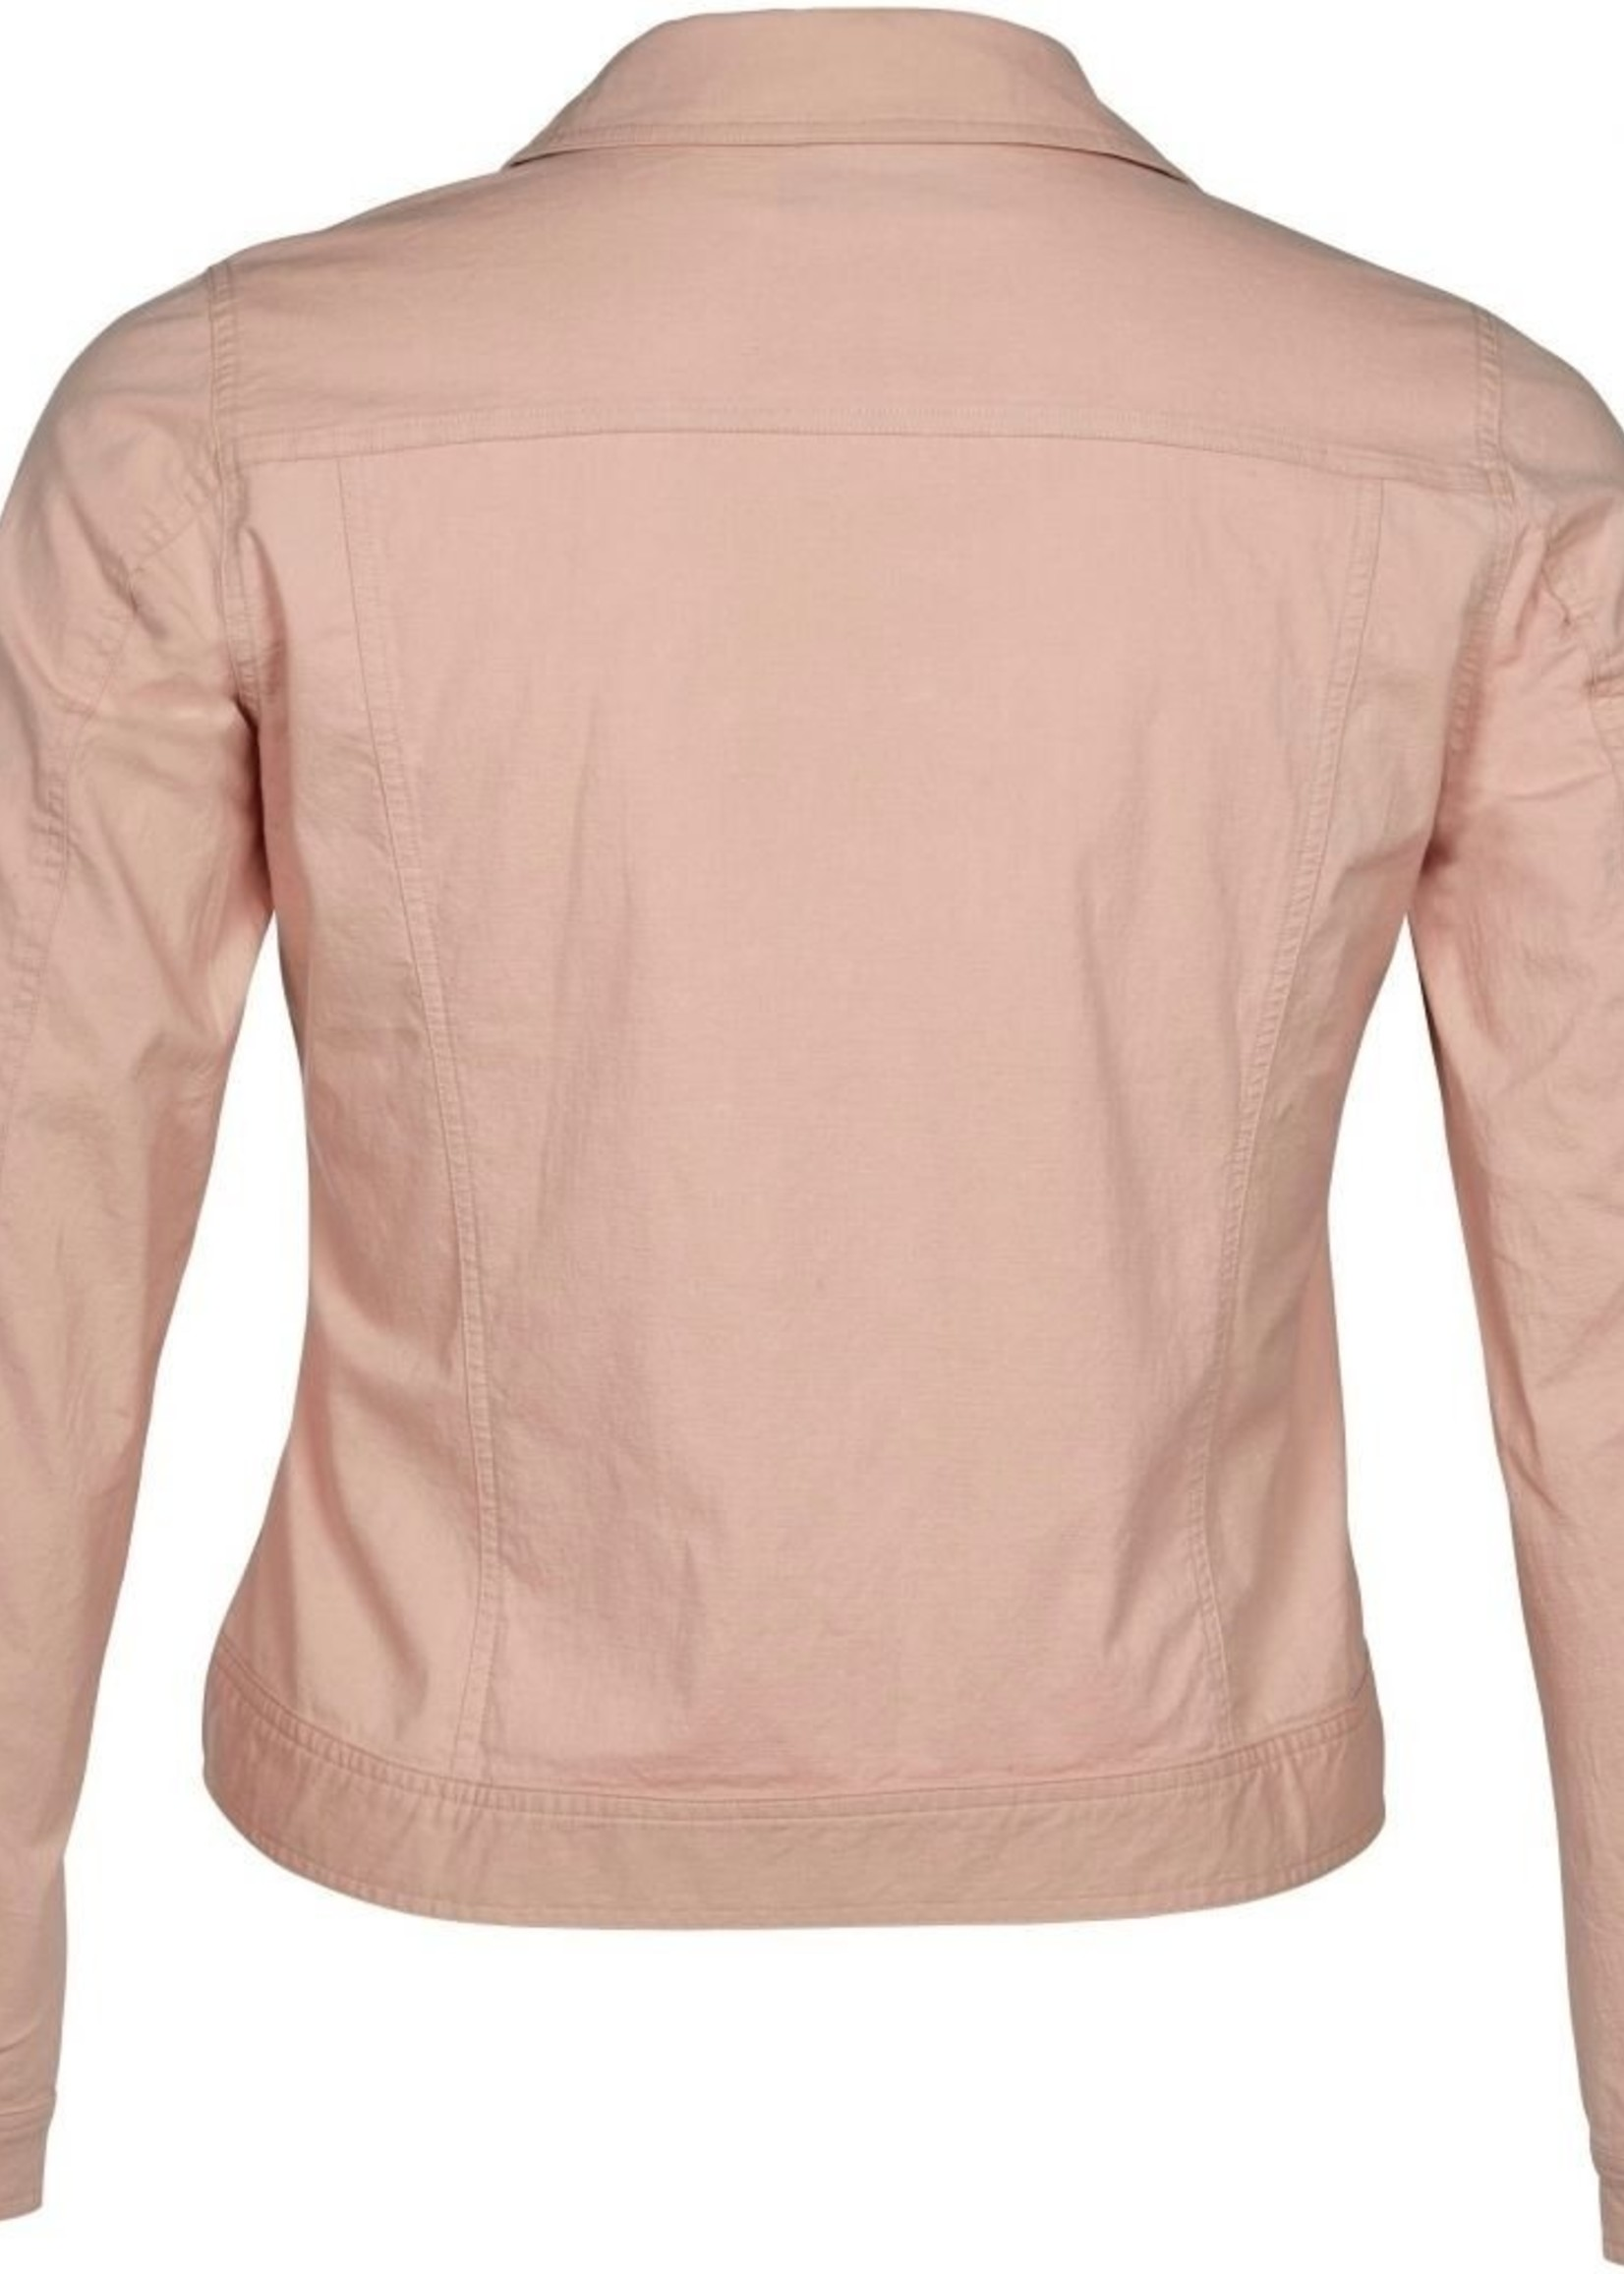 Zoey Zoey Rose Dust Jacket